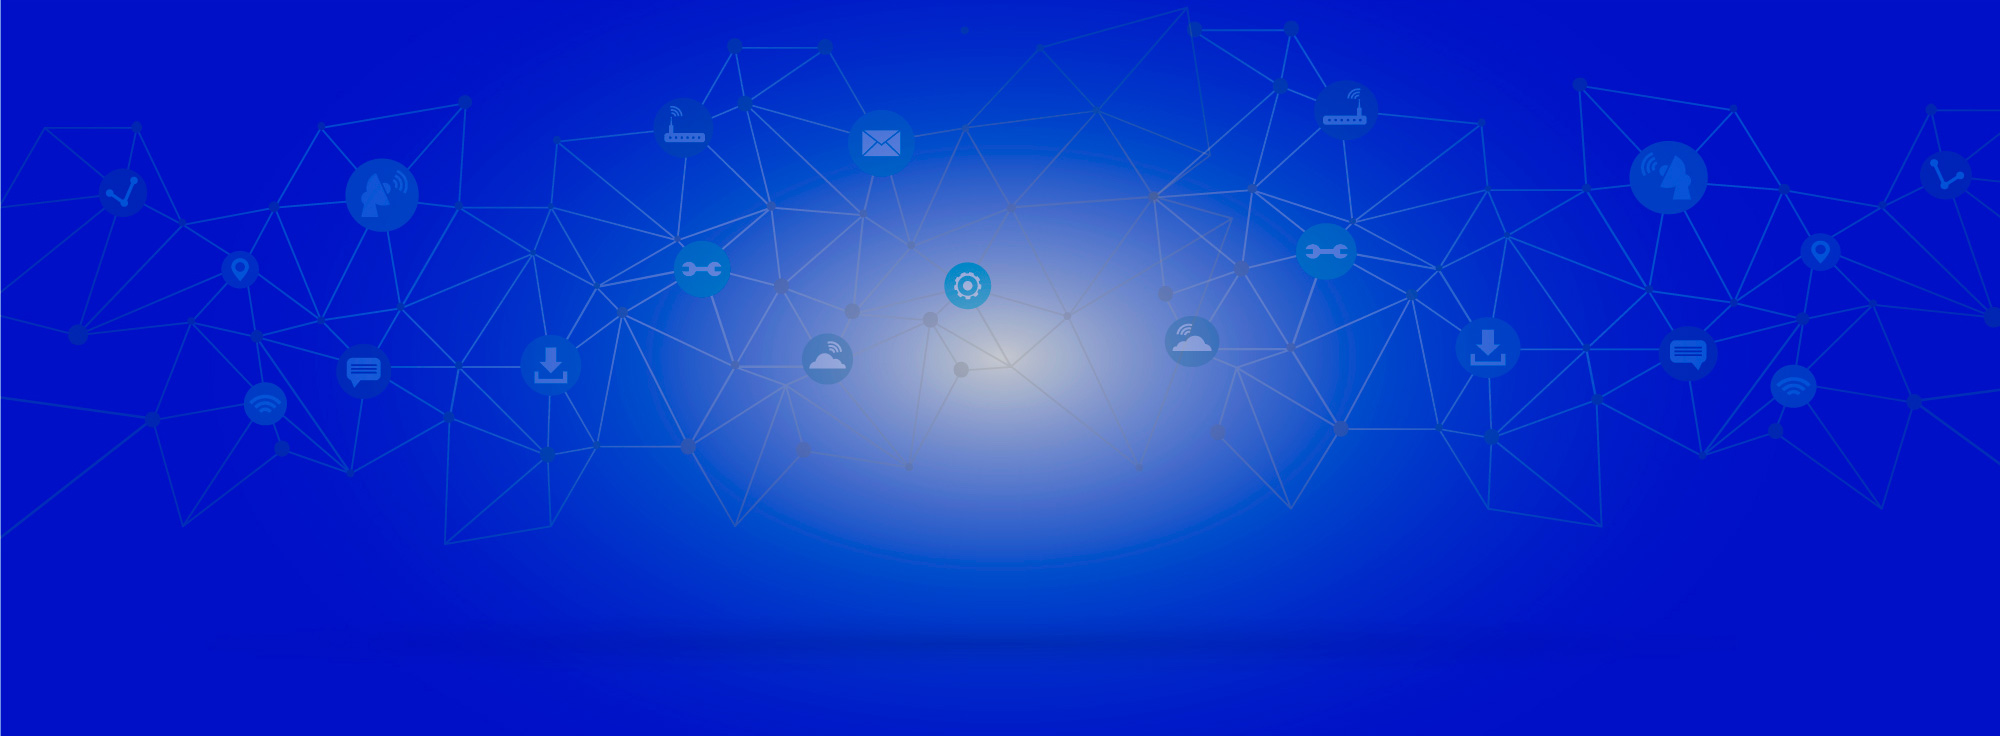 redes-web-panda-azul